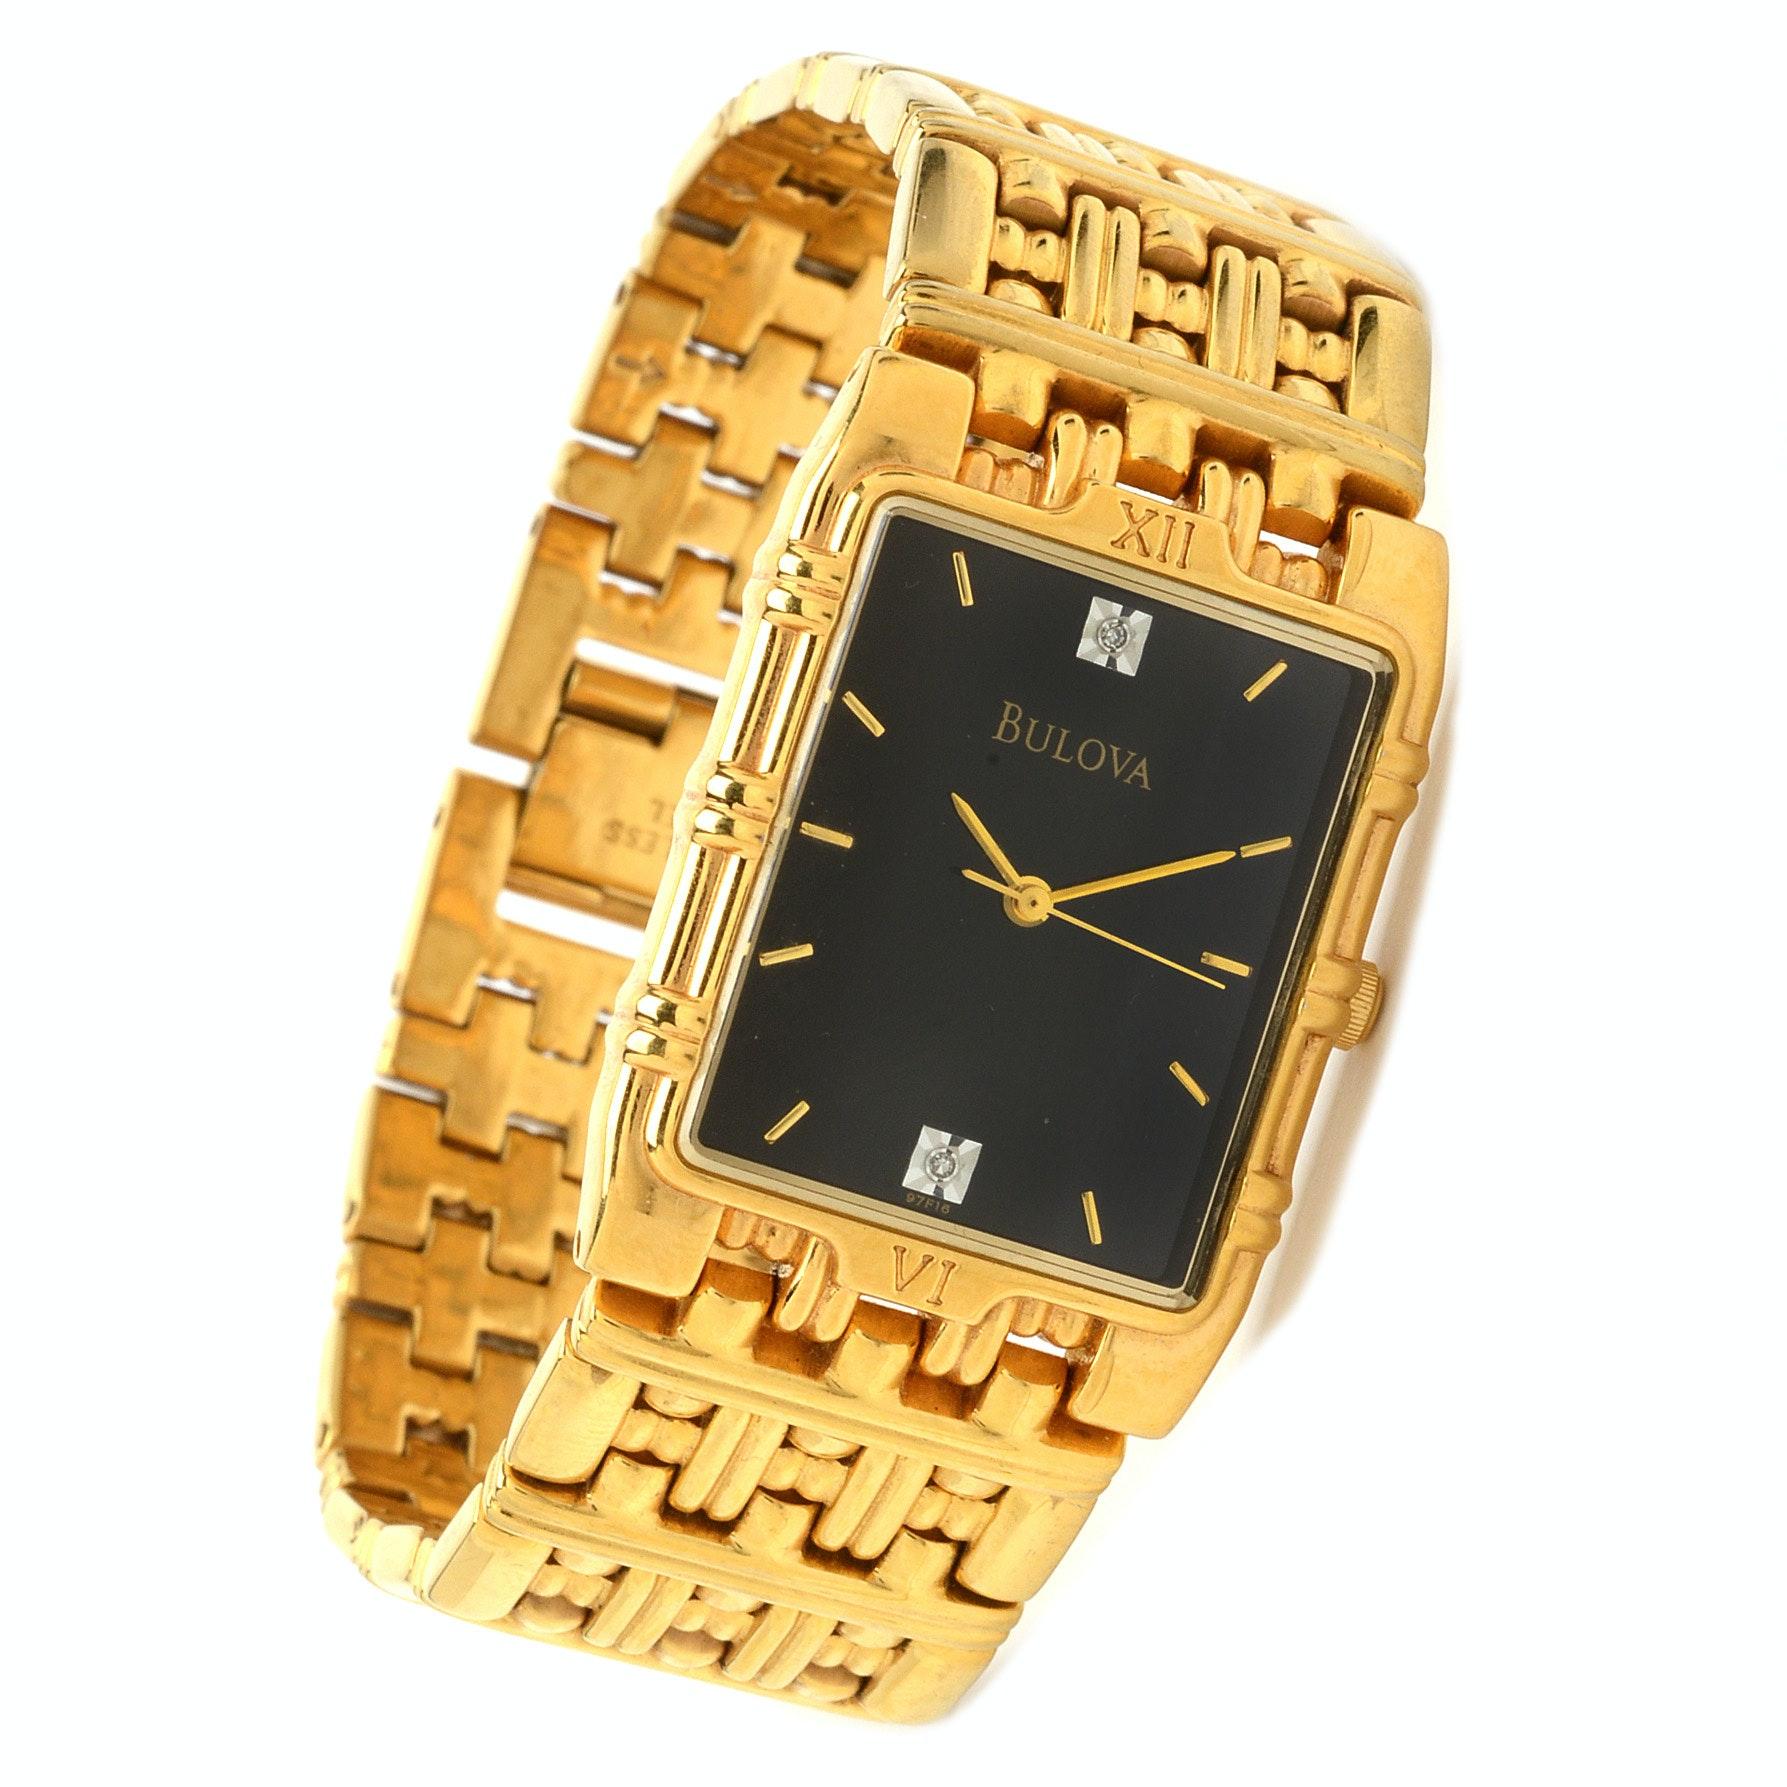 Bulova Diamond Black Dial Gold Stainless Steel Wristwatch